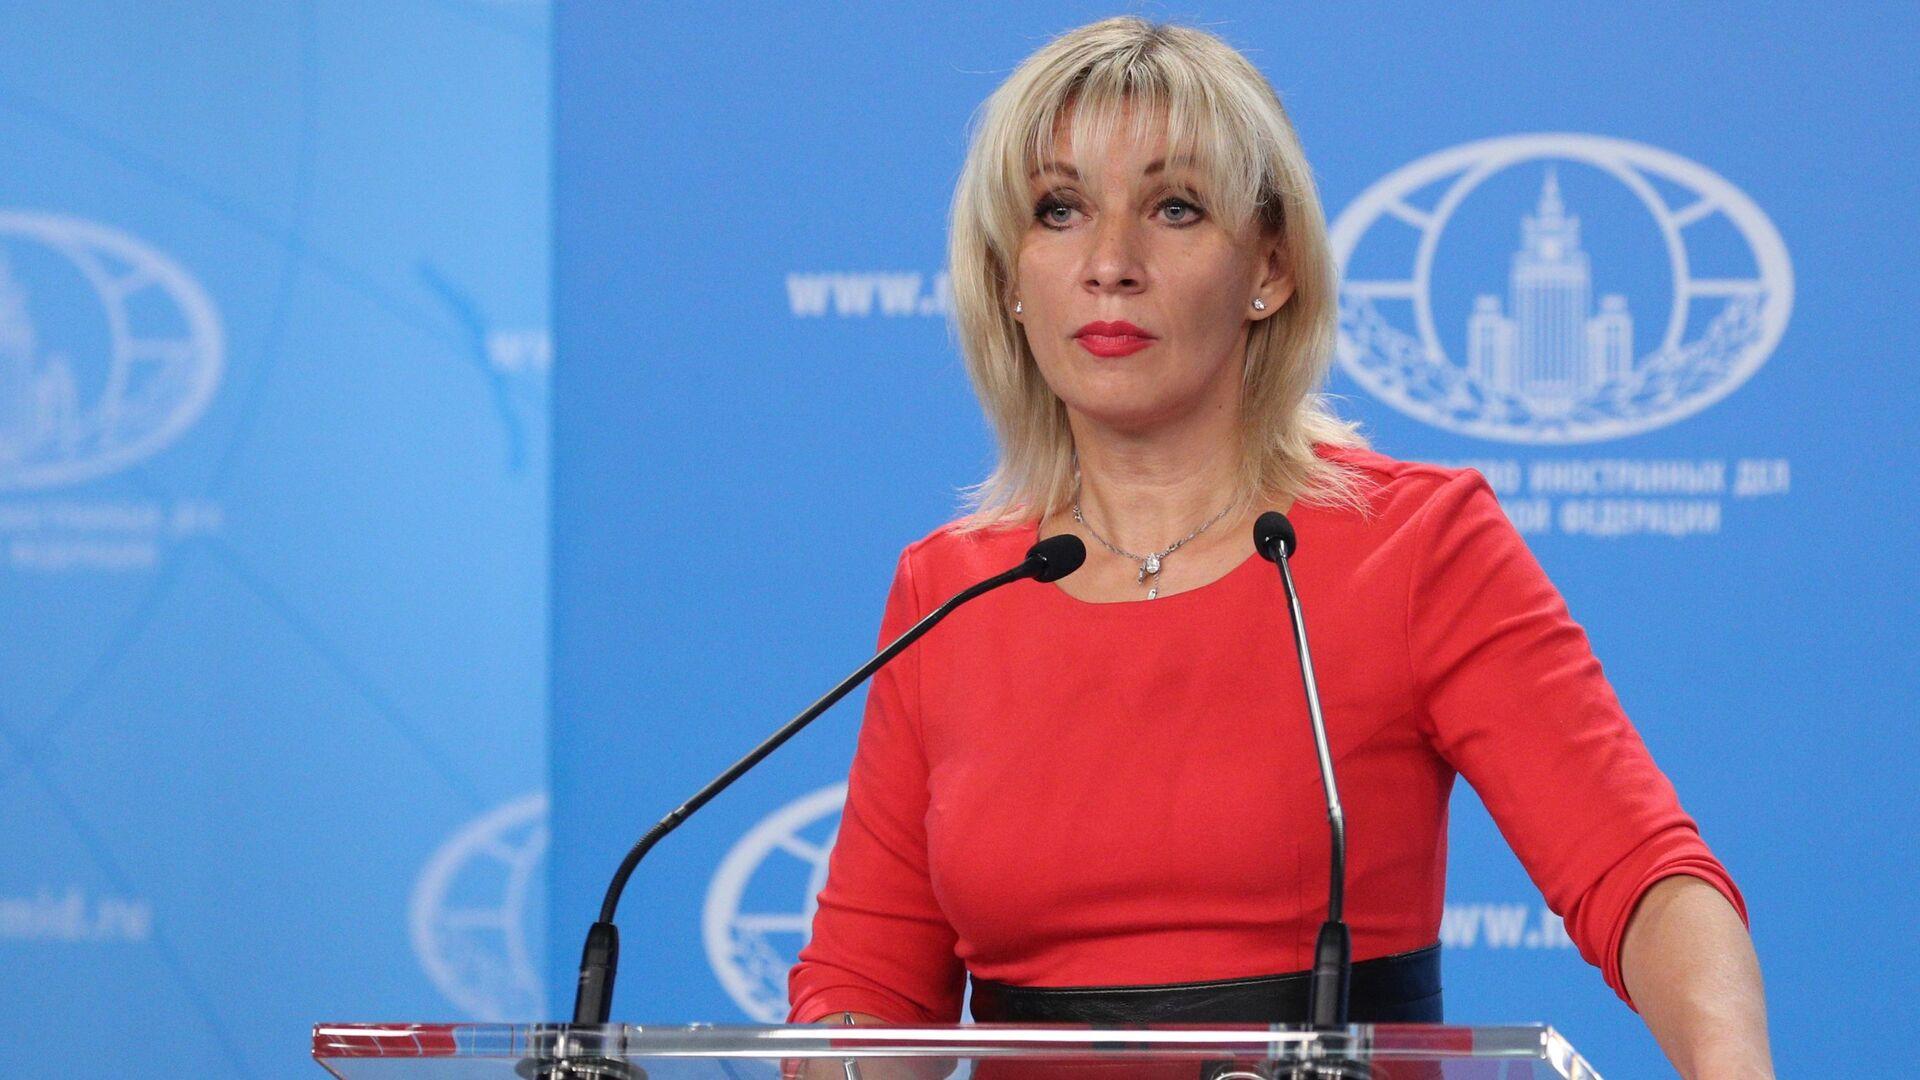 La portavoz del Ministerio ruso de Exteriores, María Zajárova. - Sputnik Mundo, 1920, 26.03.2021